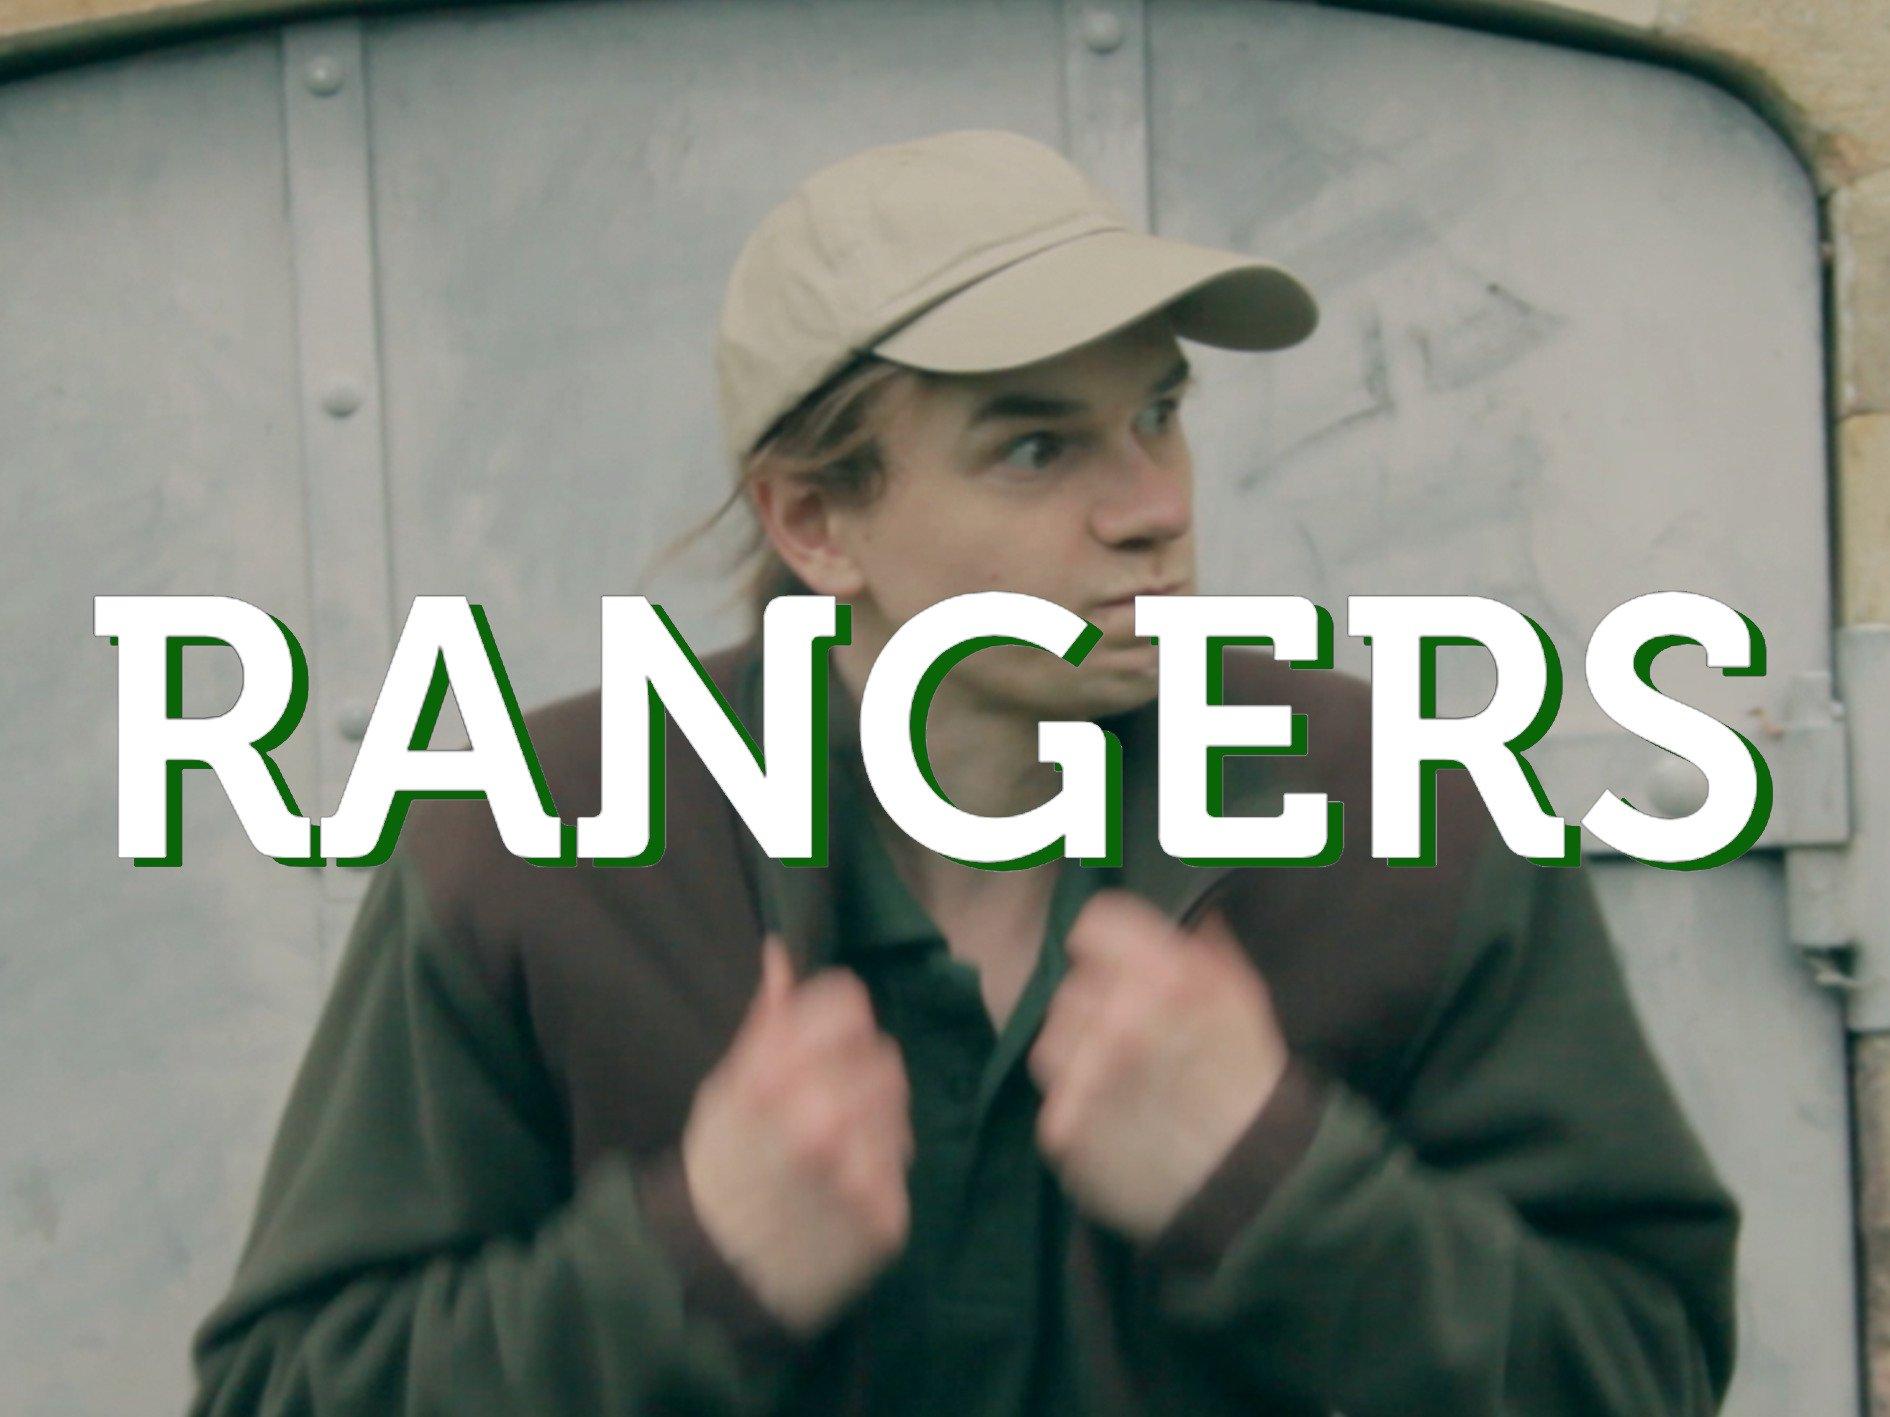 Rangers - Season 1